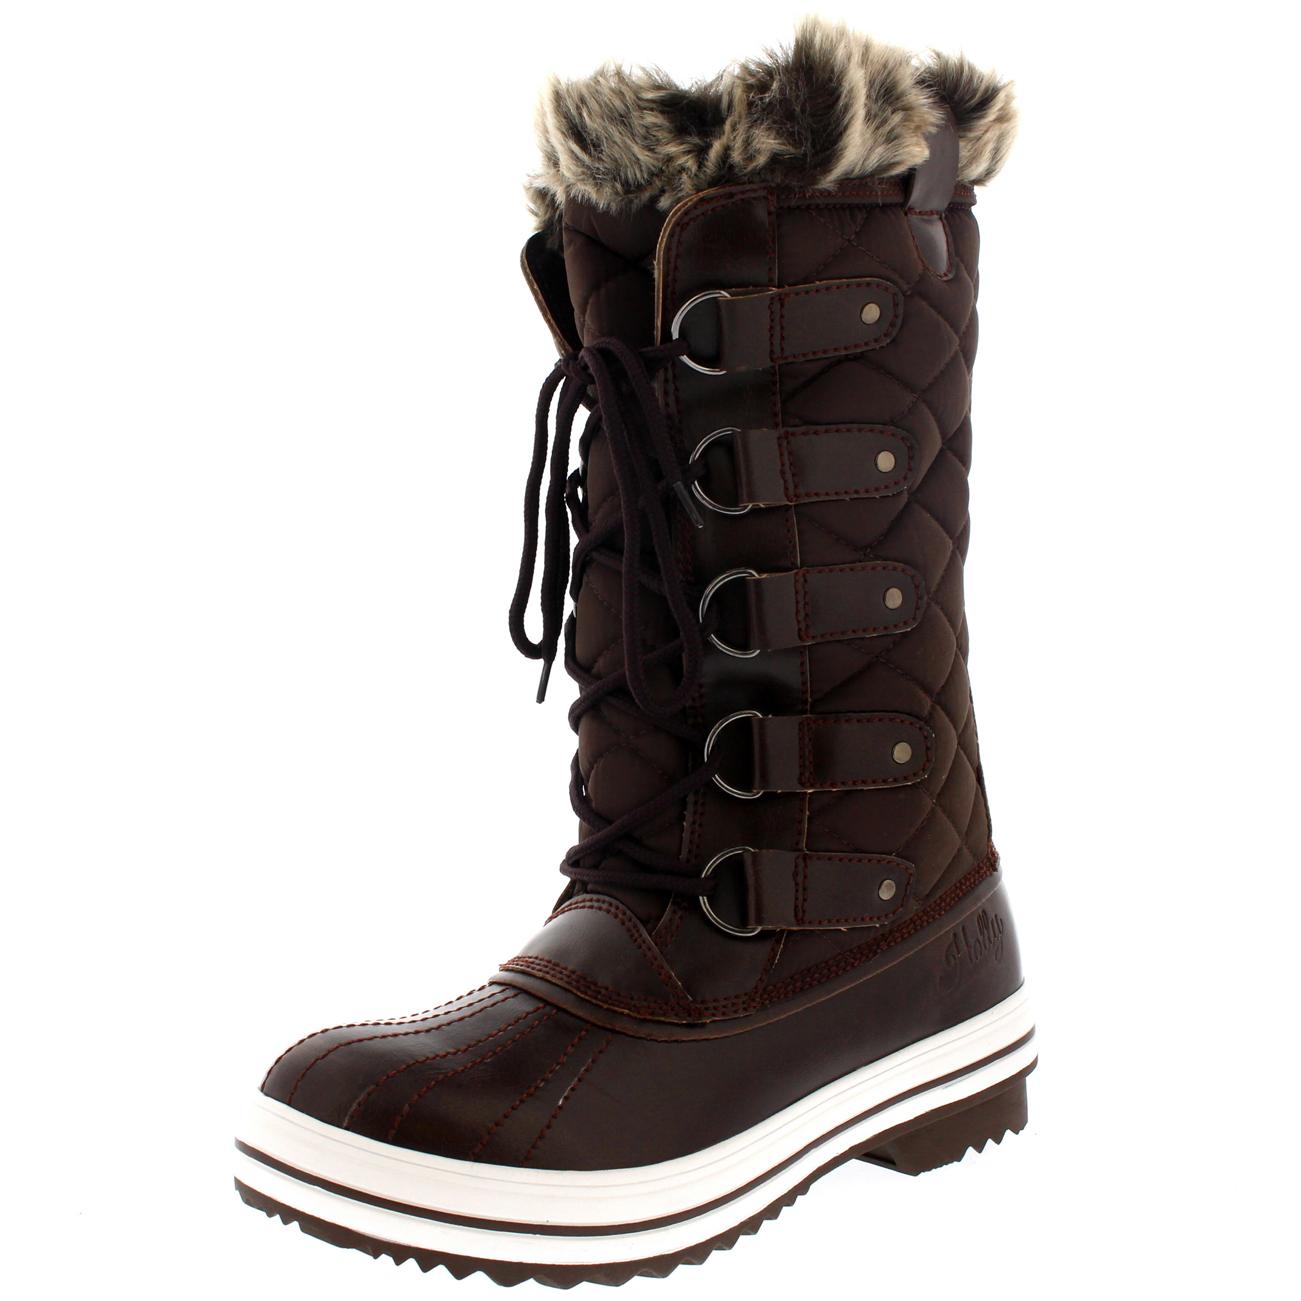 Ladies Snow Boot Nylon Tall Winter Waterproof Fur Lined Warm Rain ...